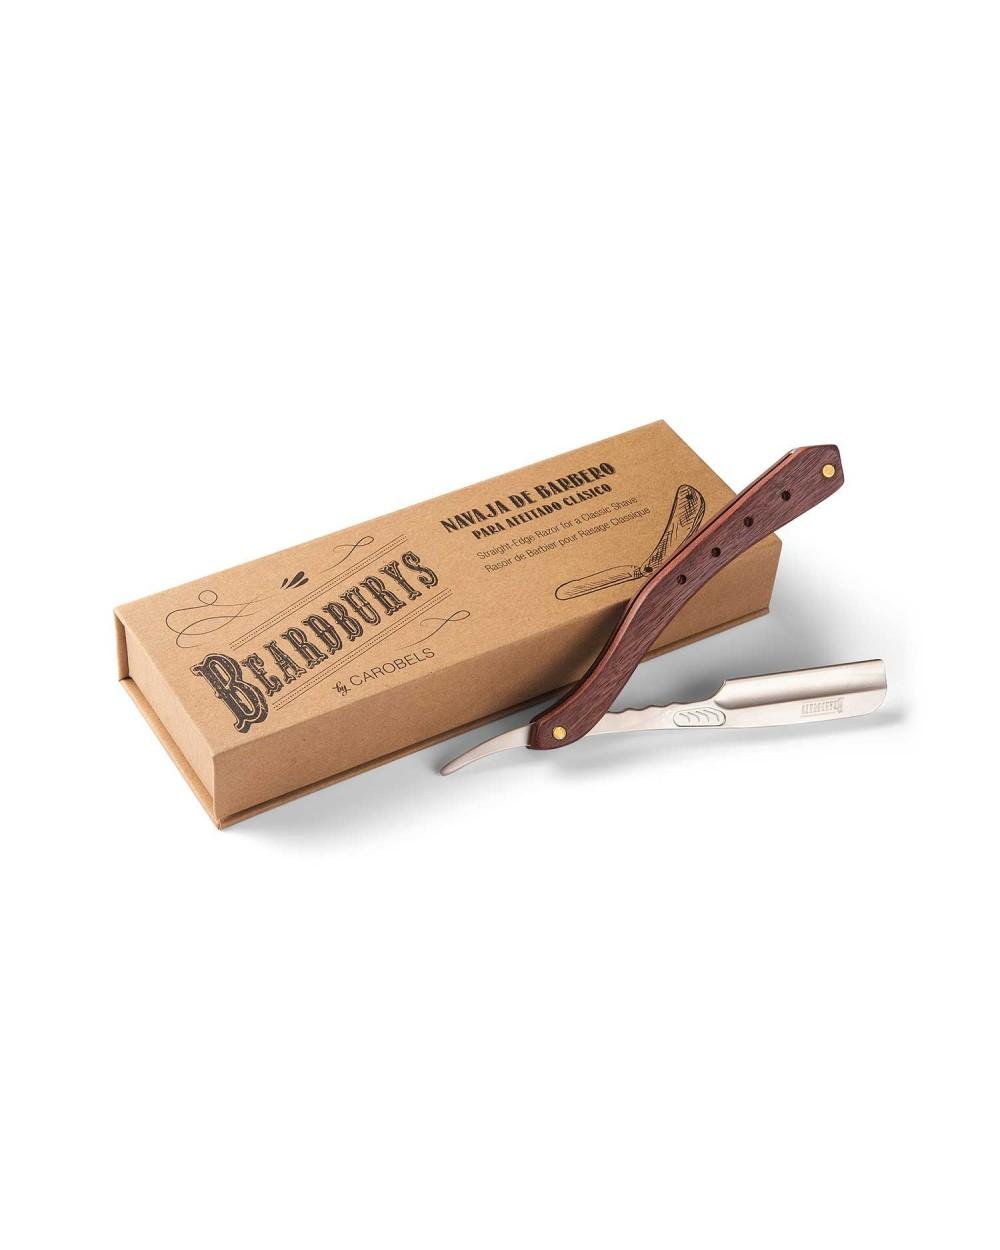 Navaja de barbero Shaving Art con caja